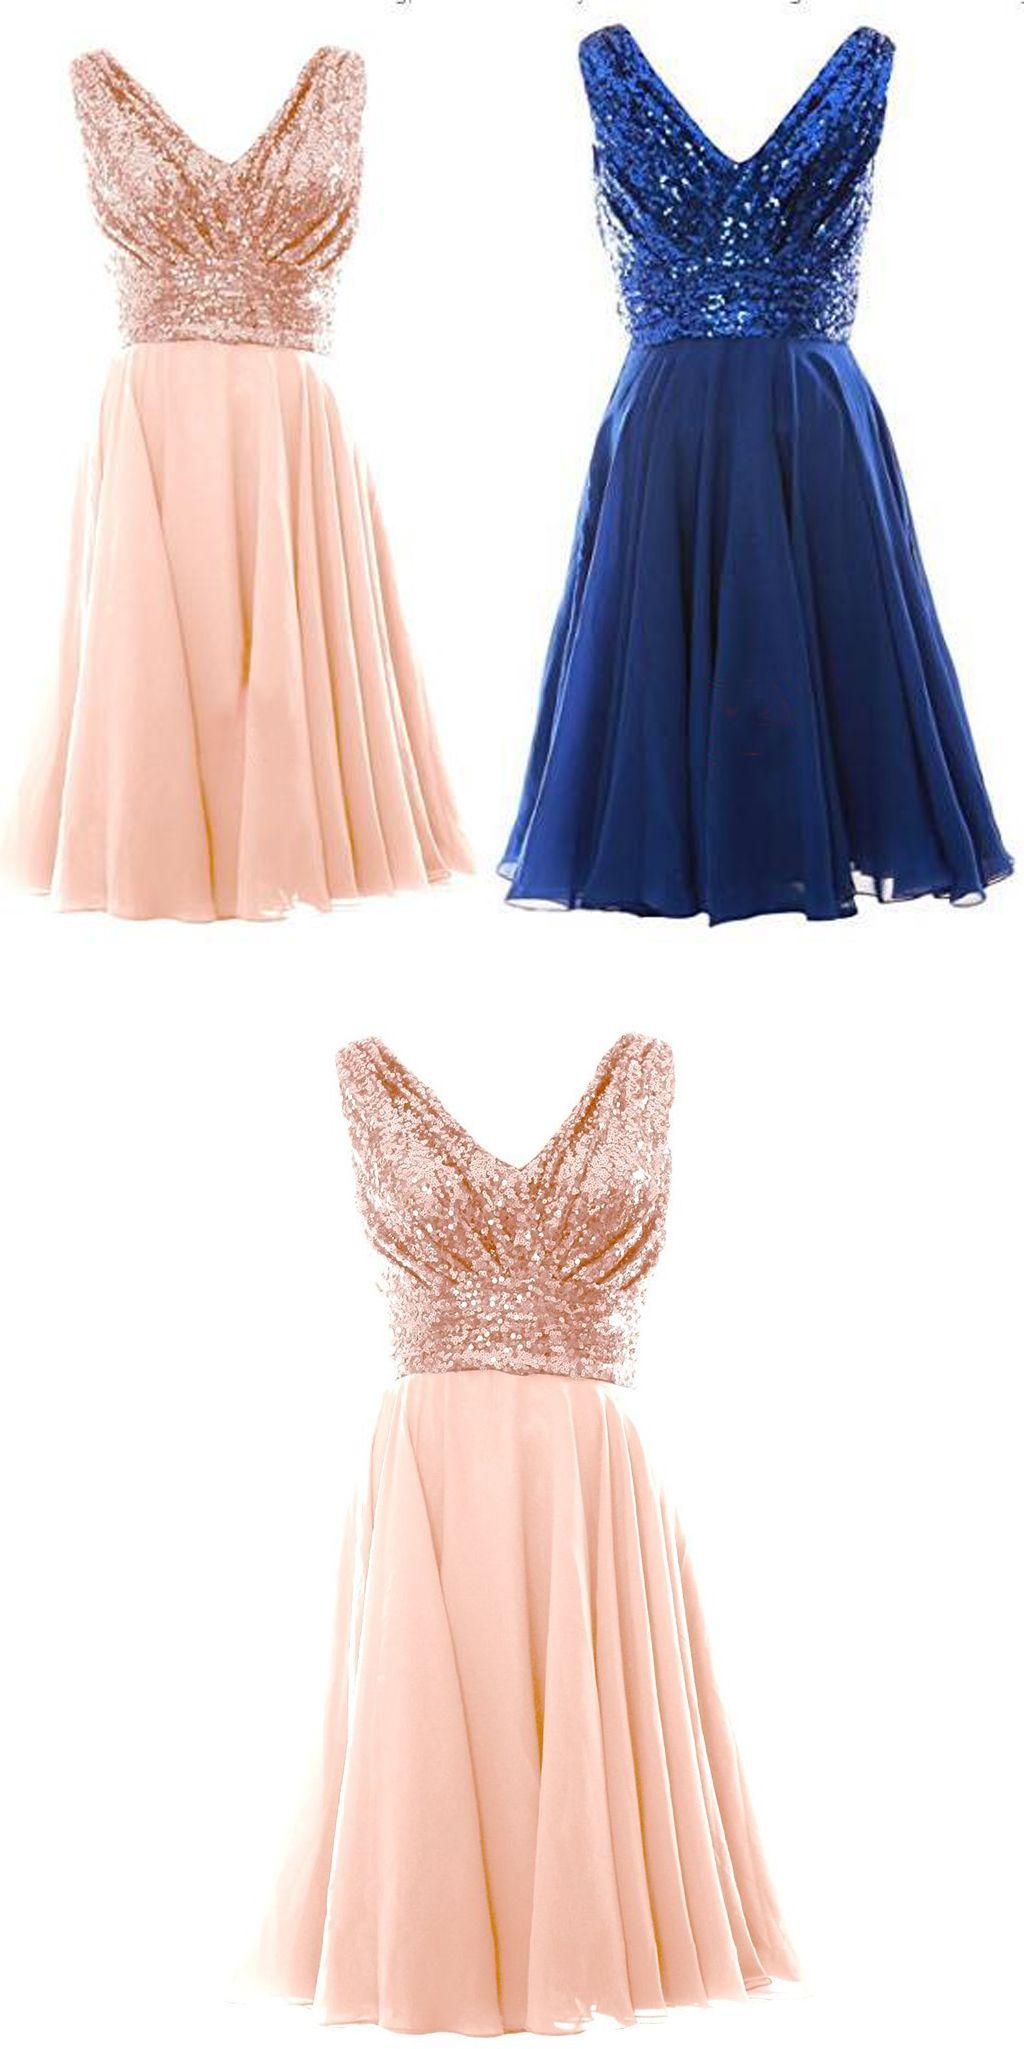 Blush Pink V Neck Sleeveless Chiffon Short Bridesmaid Dress With Rose Gold Sequins Prom Gold Dress Short Short Gold Bridesmaid Dresses Short Bridesmaid Dresses [ 2049 x 1024 Pixel ]